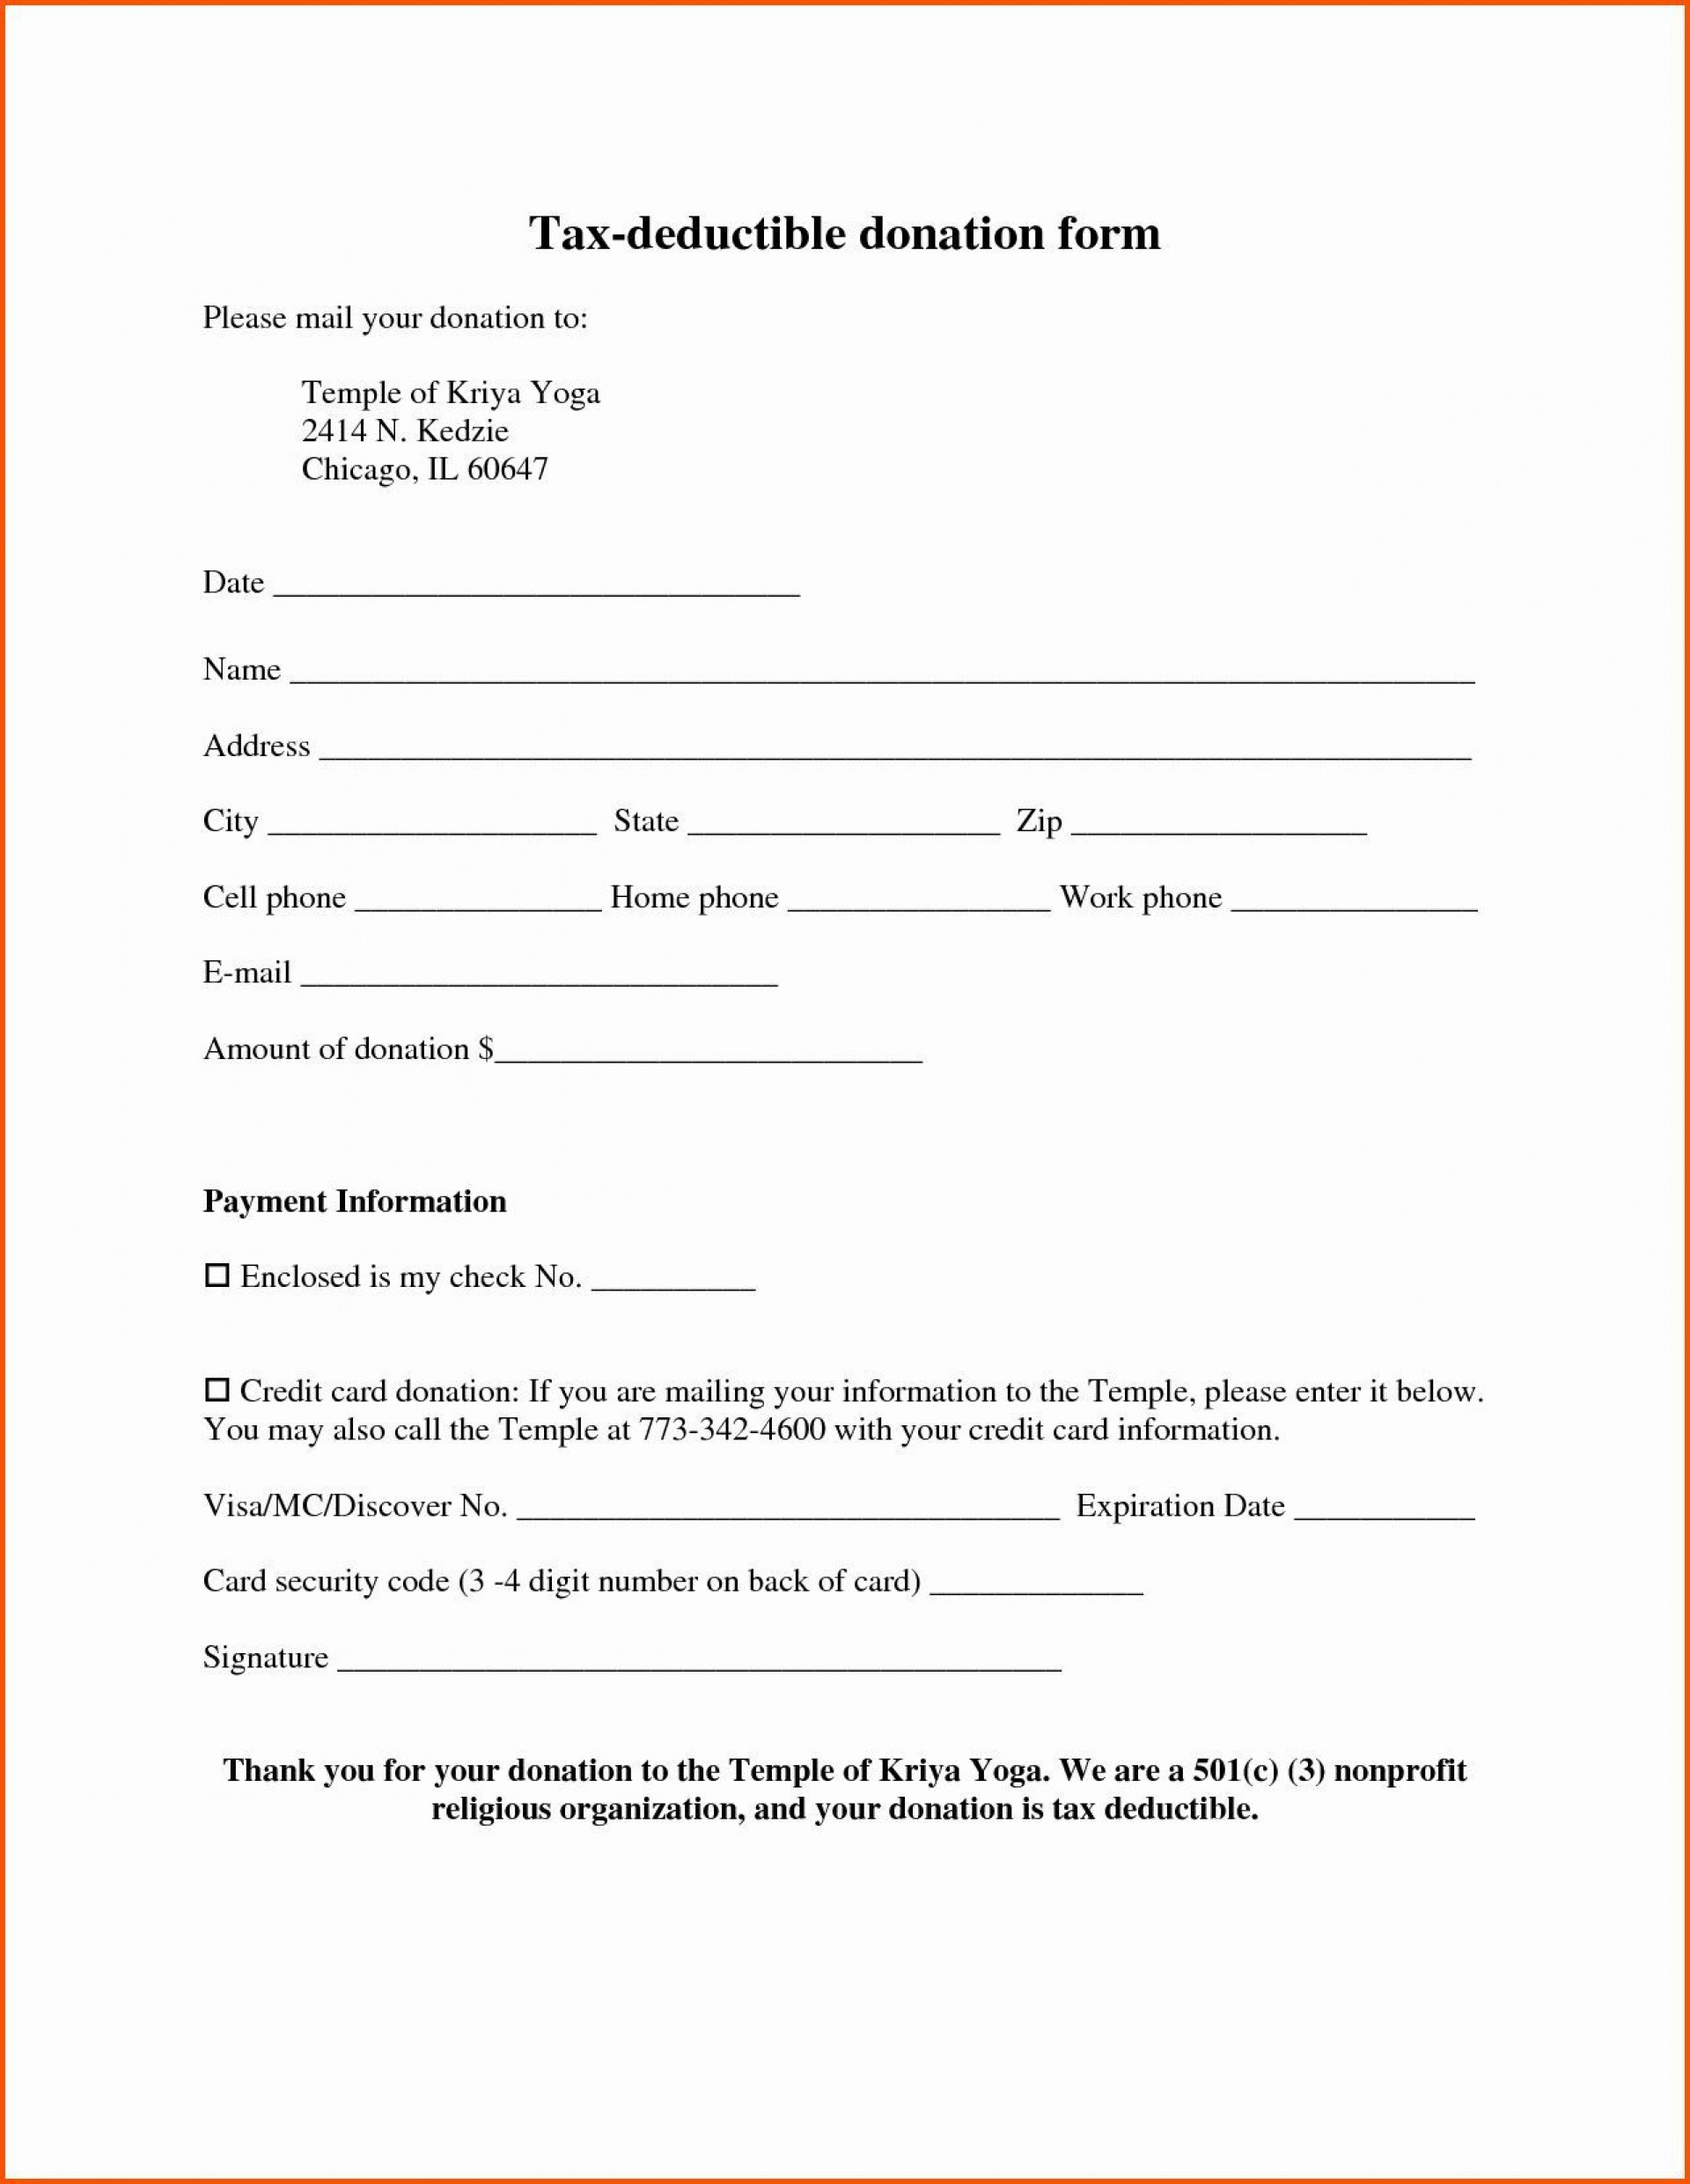 002 Marvelou Tax Deductible Donation Receipt Printable Example 1920